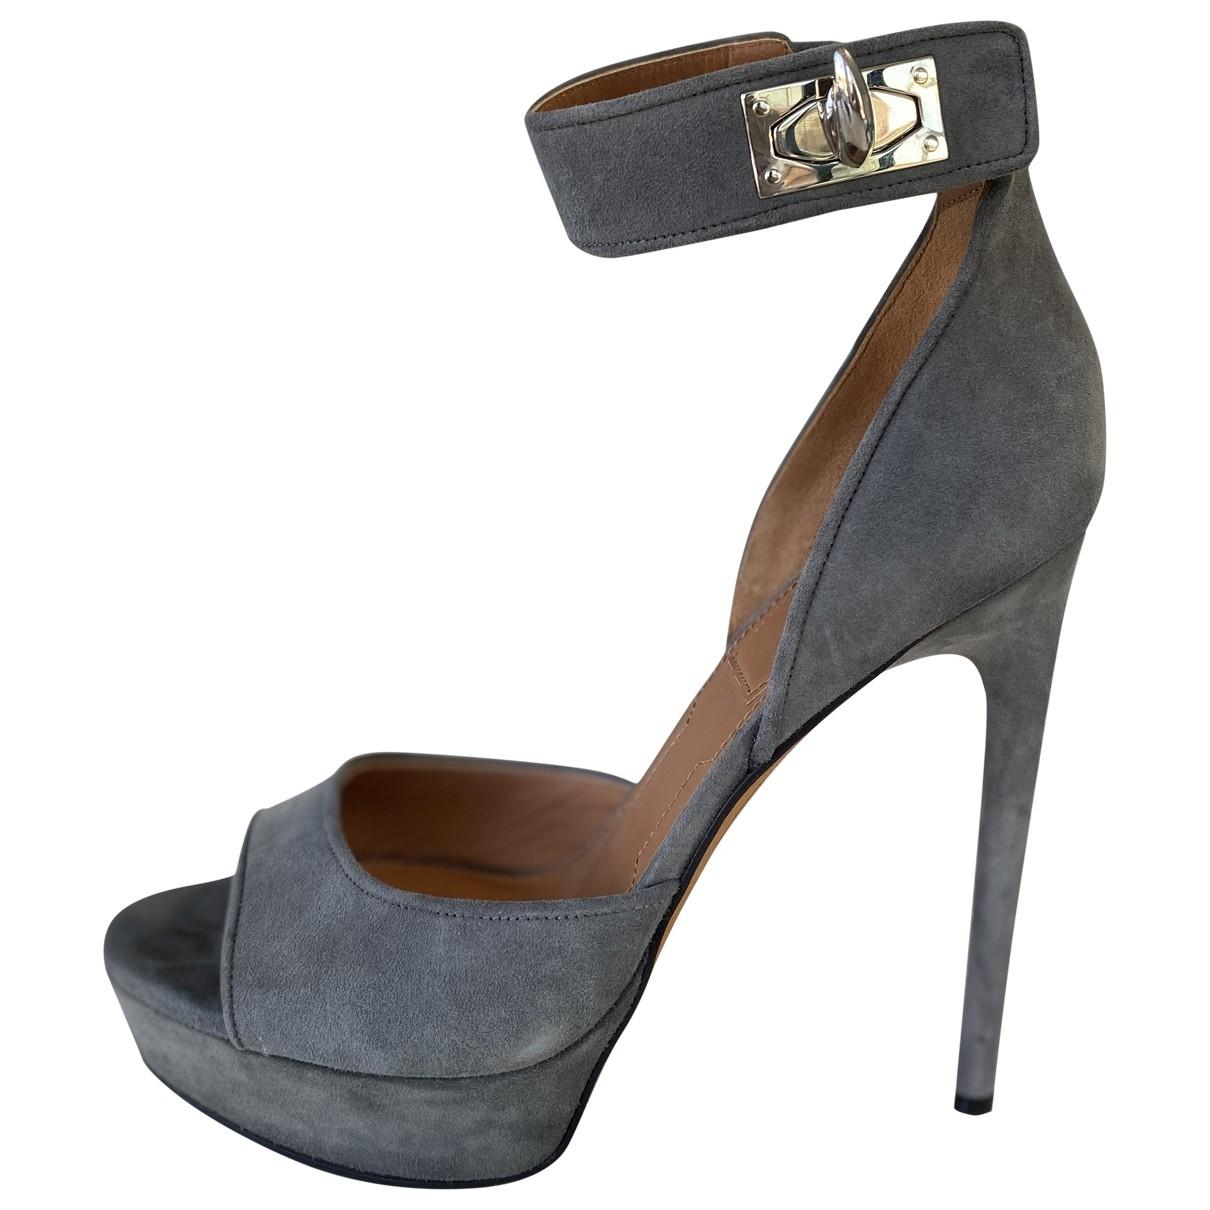 Givenchy \N Grey Suede Heels for Women 38 EU